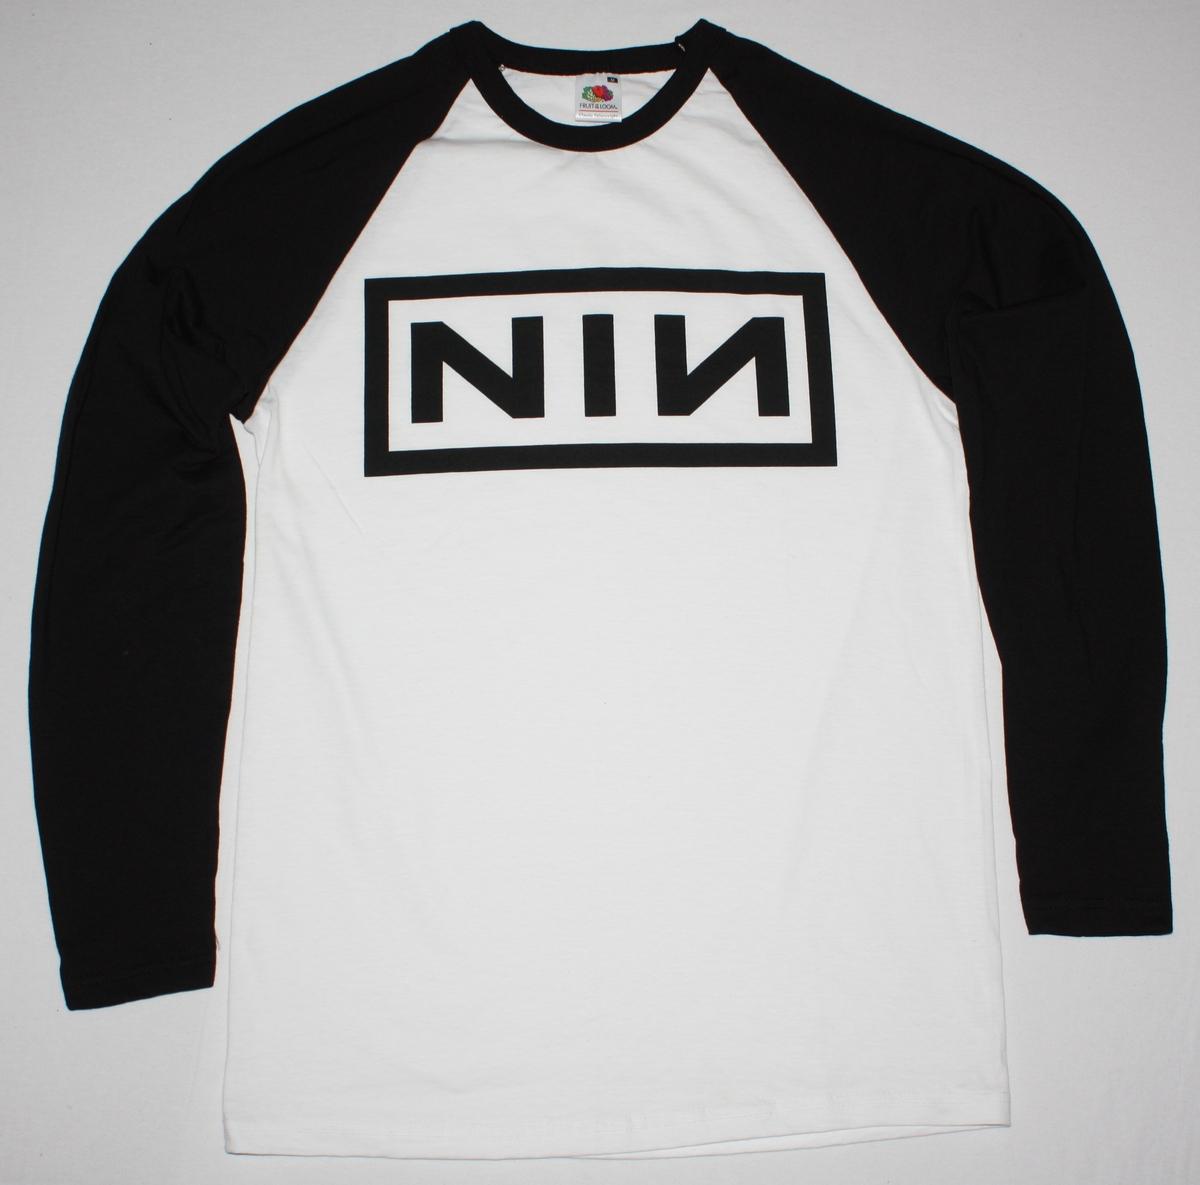 NINE INCH NAILS LOGO NIN TRENT REZNOR NEW WHITE/BLACK LONG SLEEVE ...